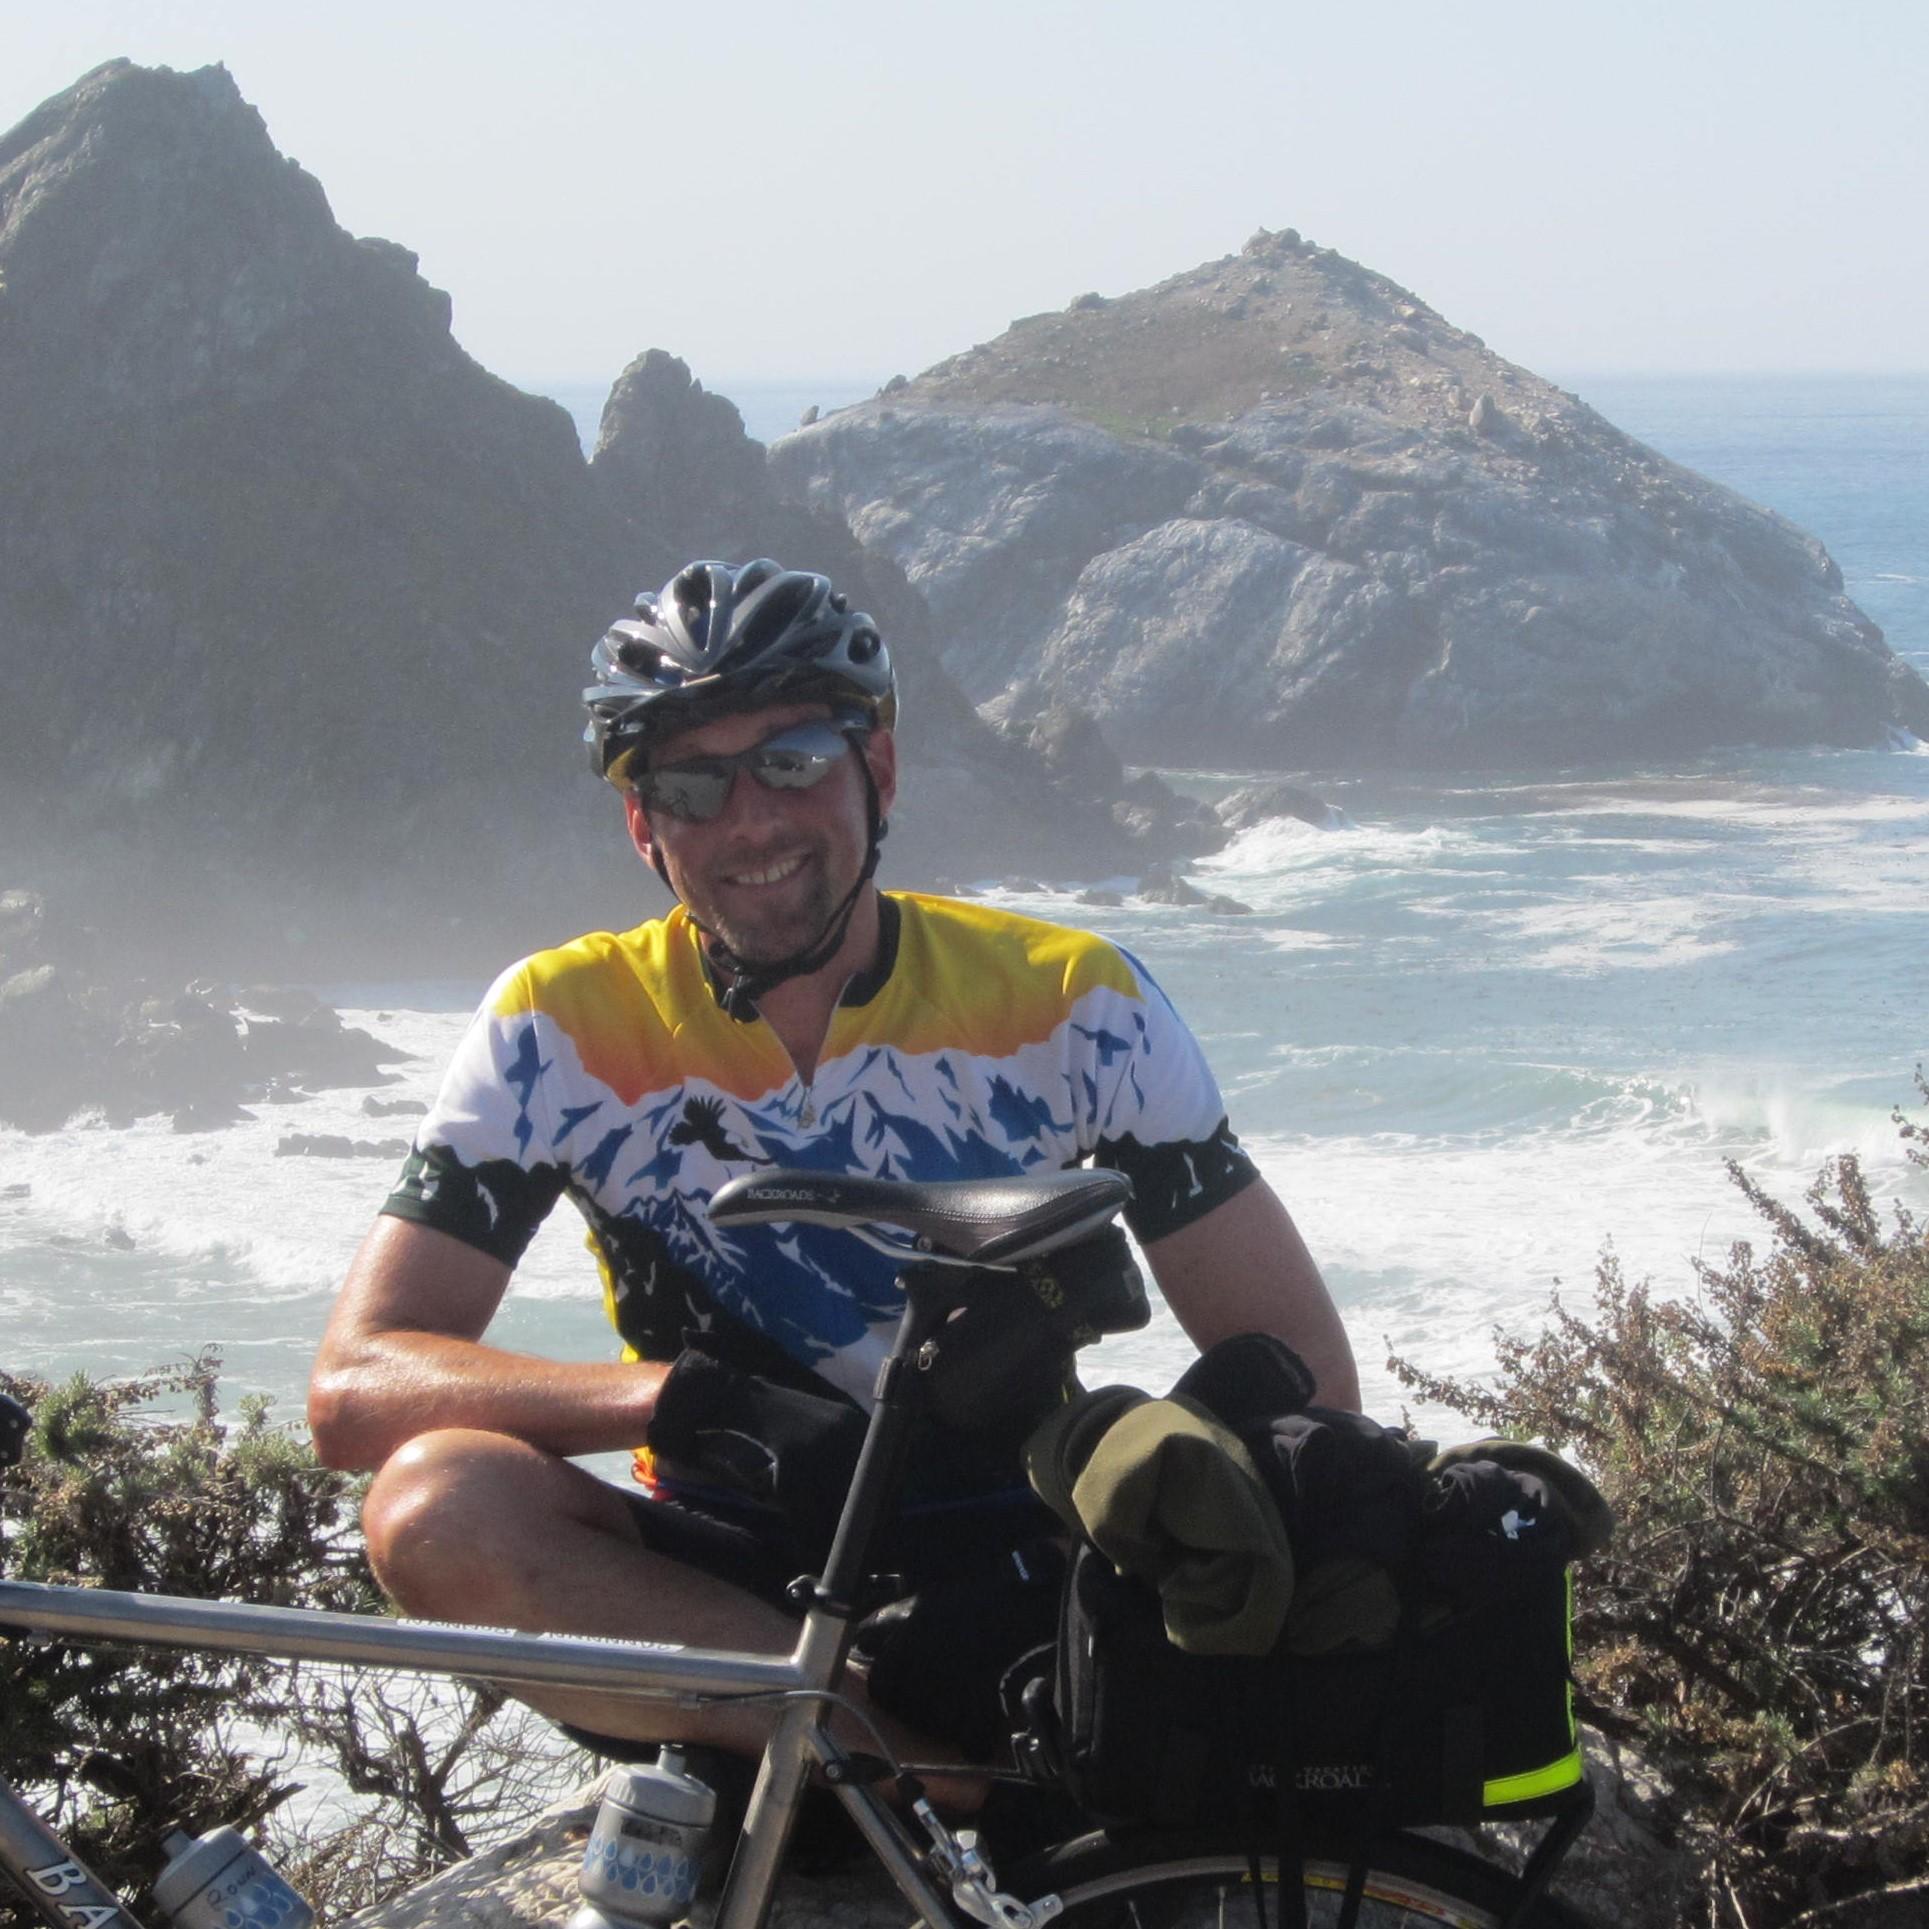 Ronn Seely, Bike Guide